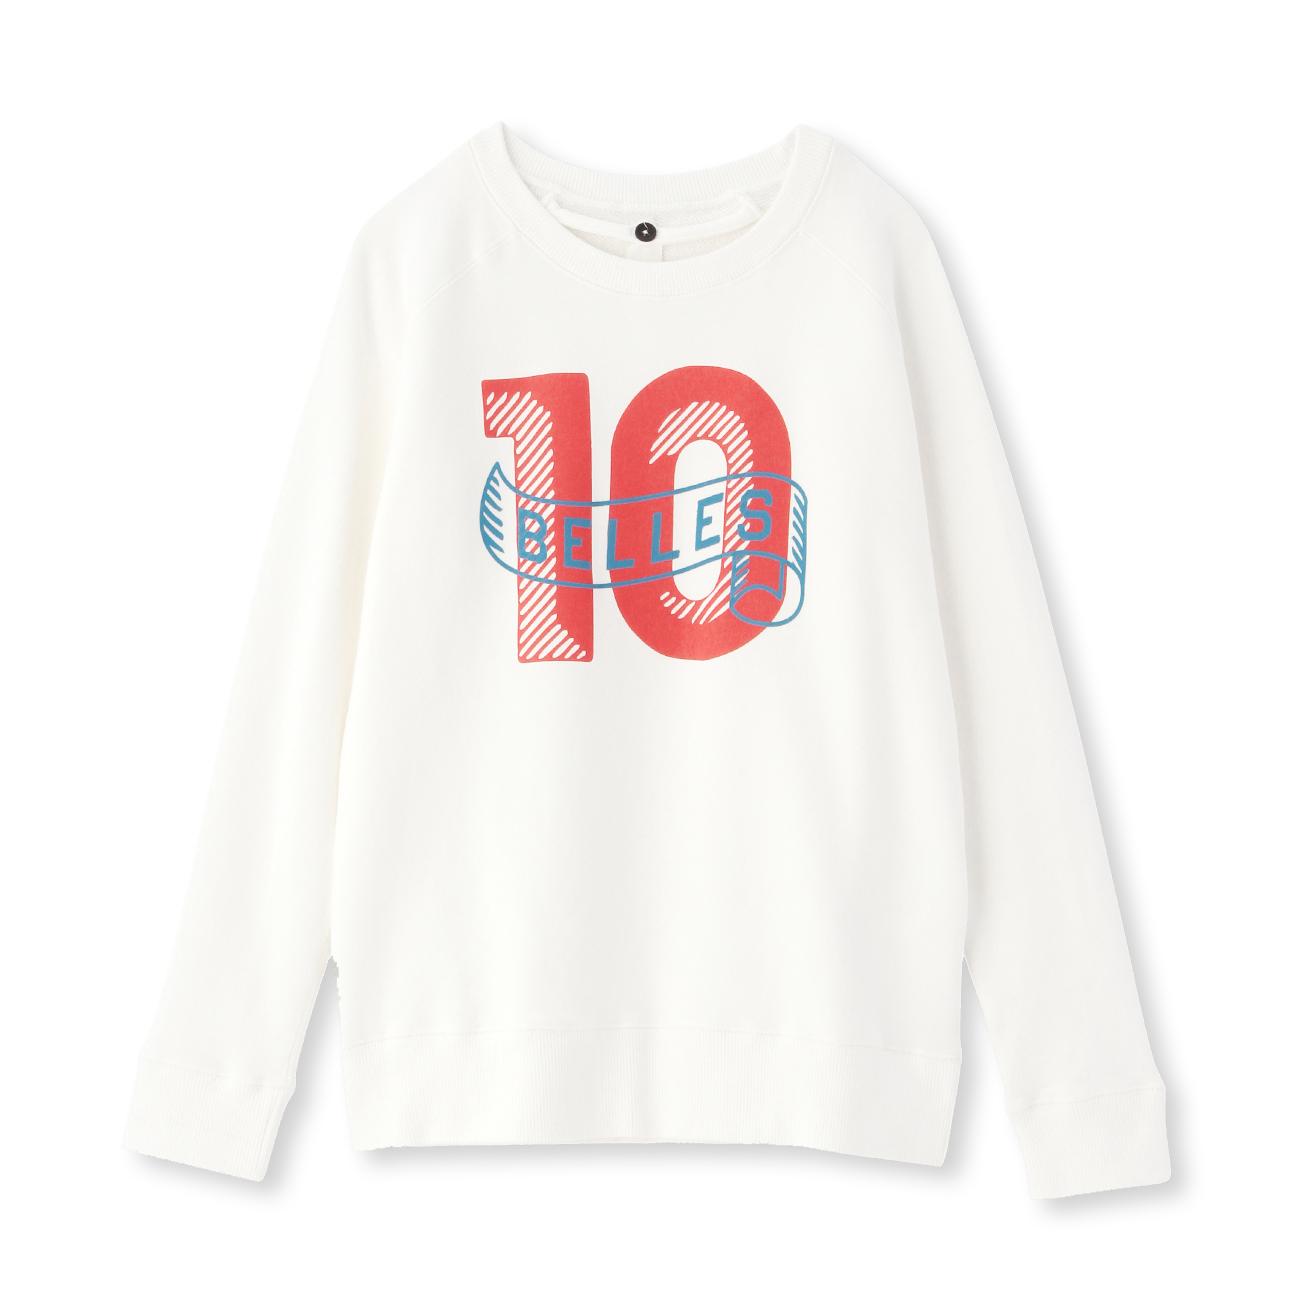 【aquagirl (アクアガール)】20周年別注アイテム VENERTA knitwear プルオーバーレディース トップス|その他トップス ホワイト